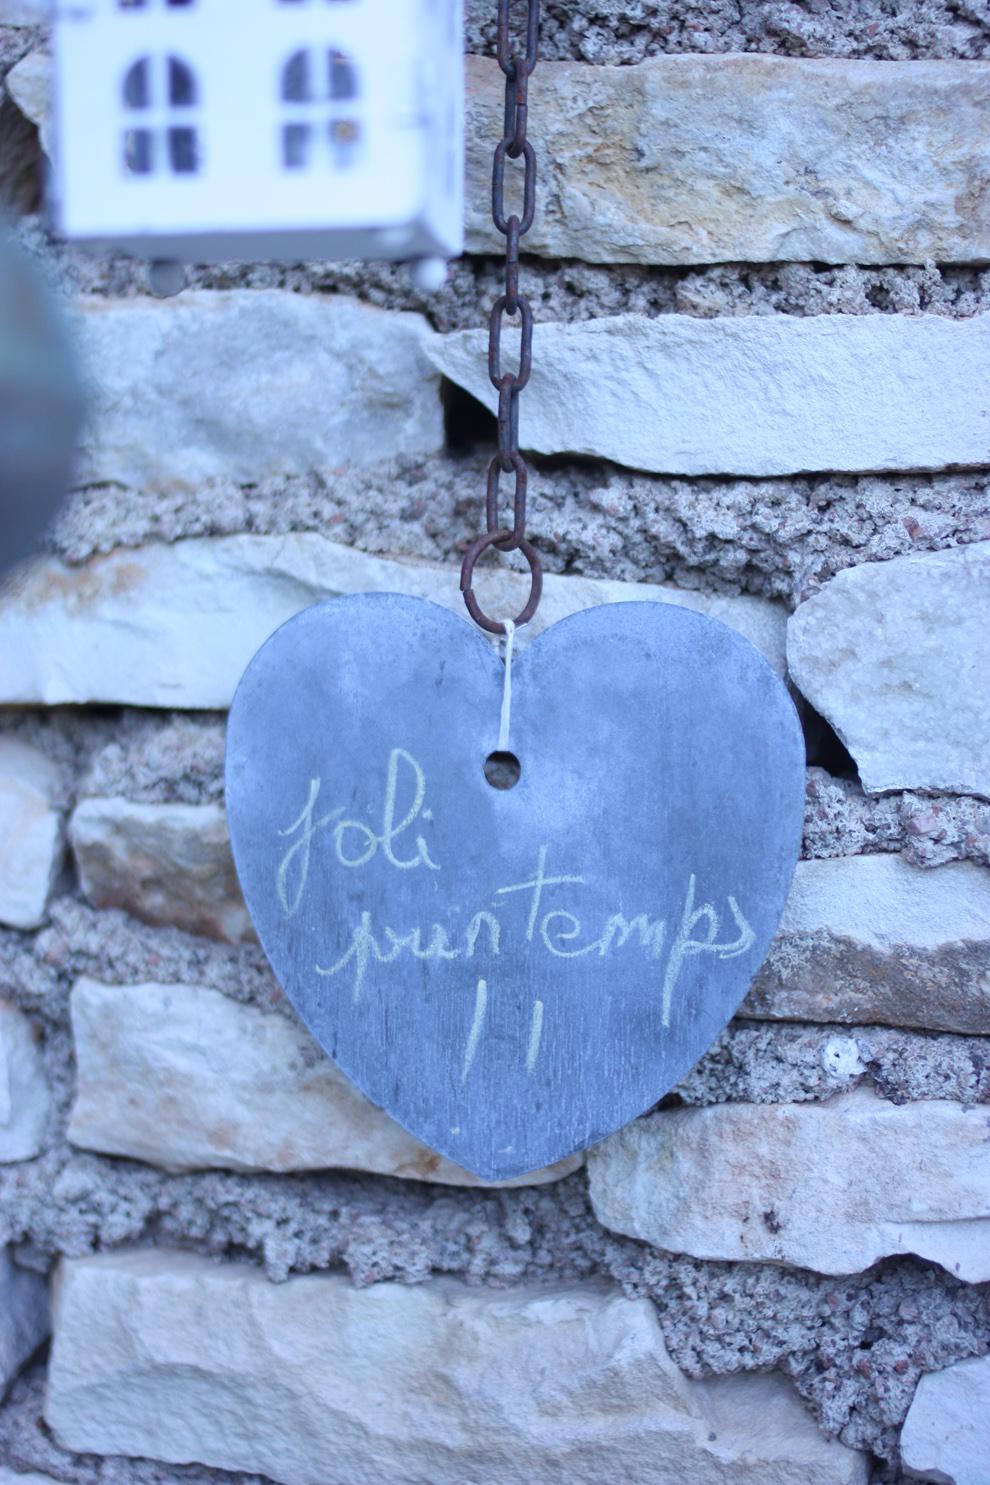 French_Garden_joli_Printemps